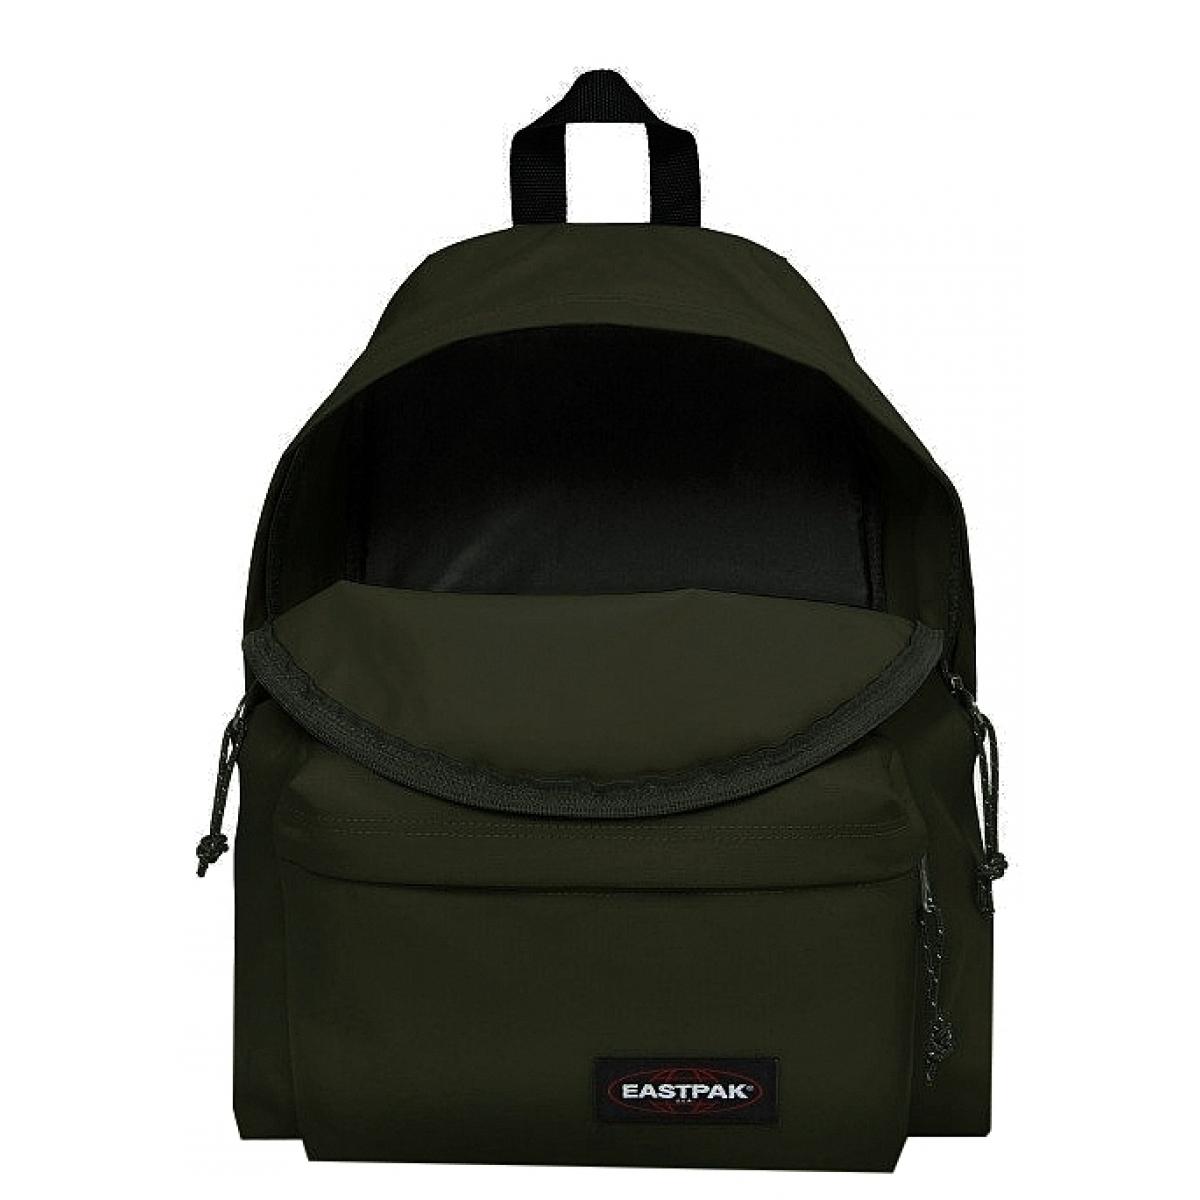 sac dos scolaire eastpak ek620 bush khaki ek62049s. Black Bedroom Furniture Sets. Home Design Ideas